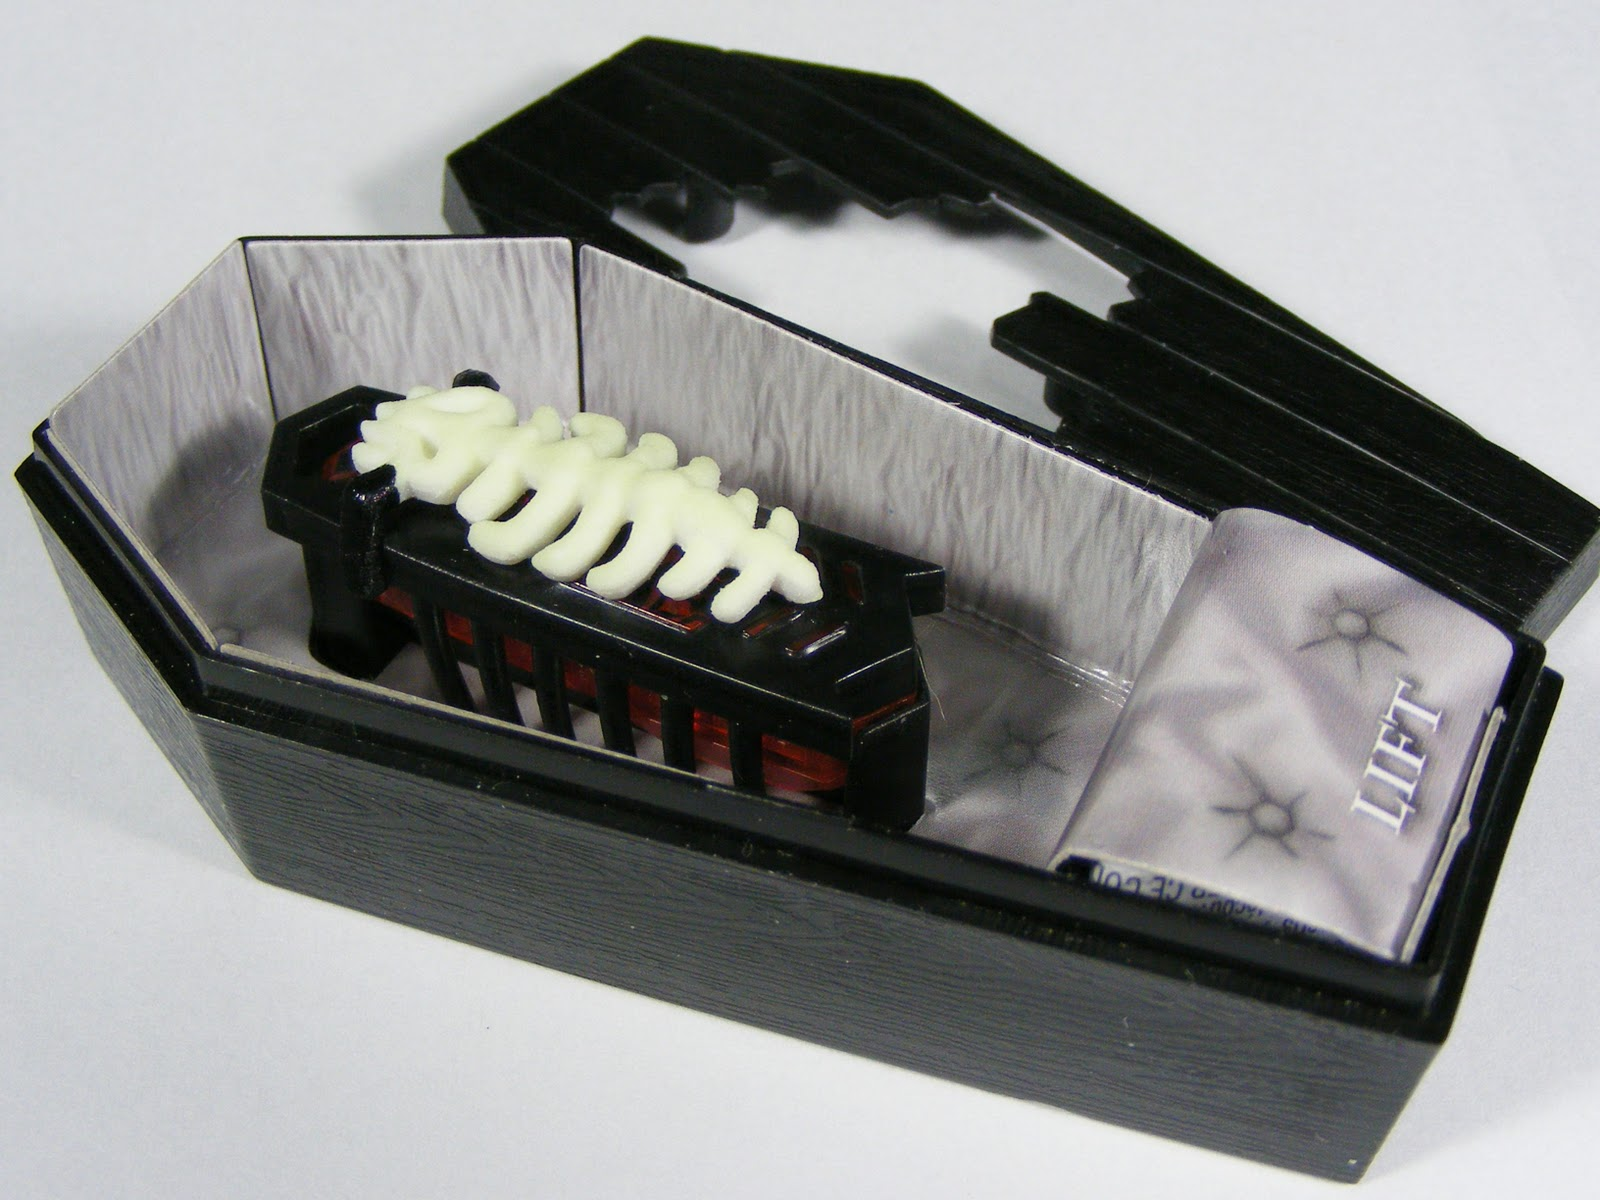 http://3.bp.blogspot.com/-WHiLUM6Lbv4/Tn3qUpssk5I/AAAAAAAABM8/hnNXaT1Y-Ik/s1600/coffin+4.jpg